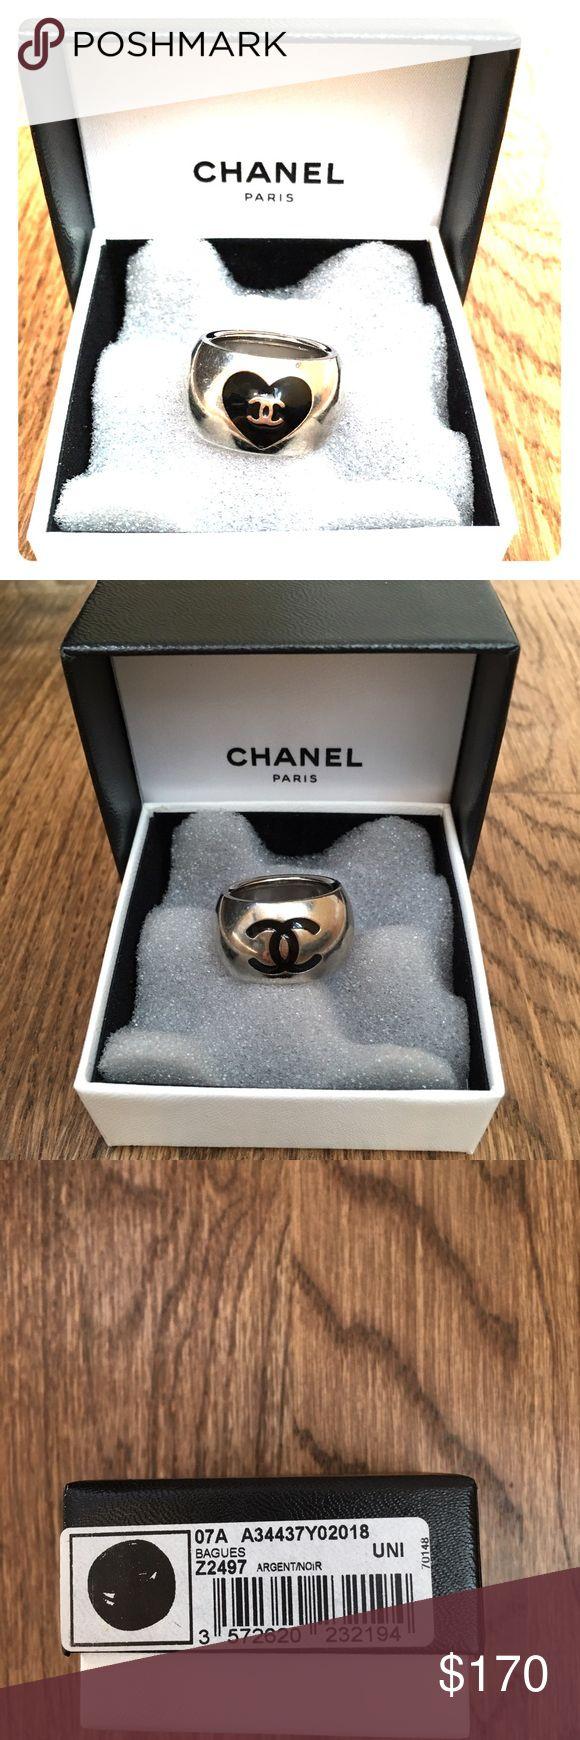 Chanel schmuck cc